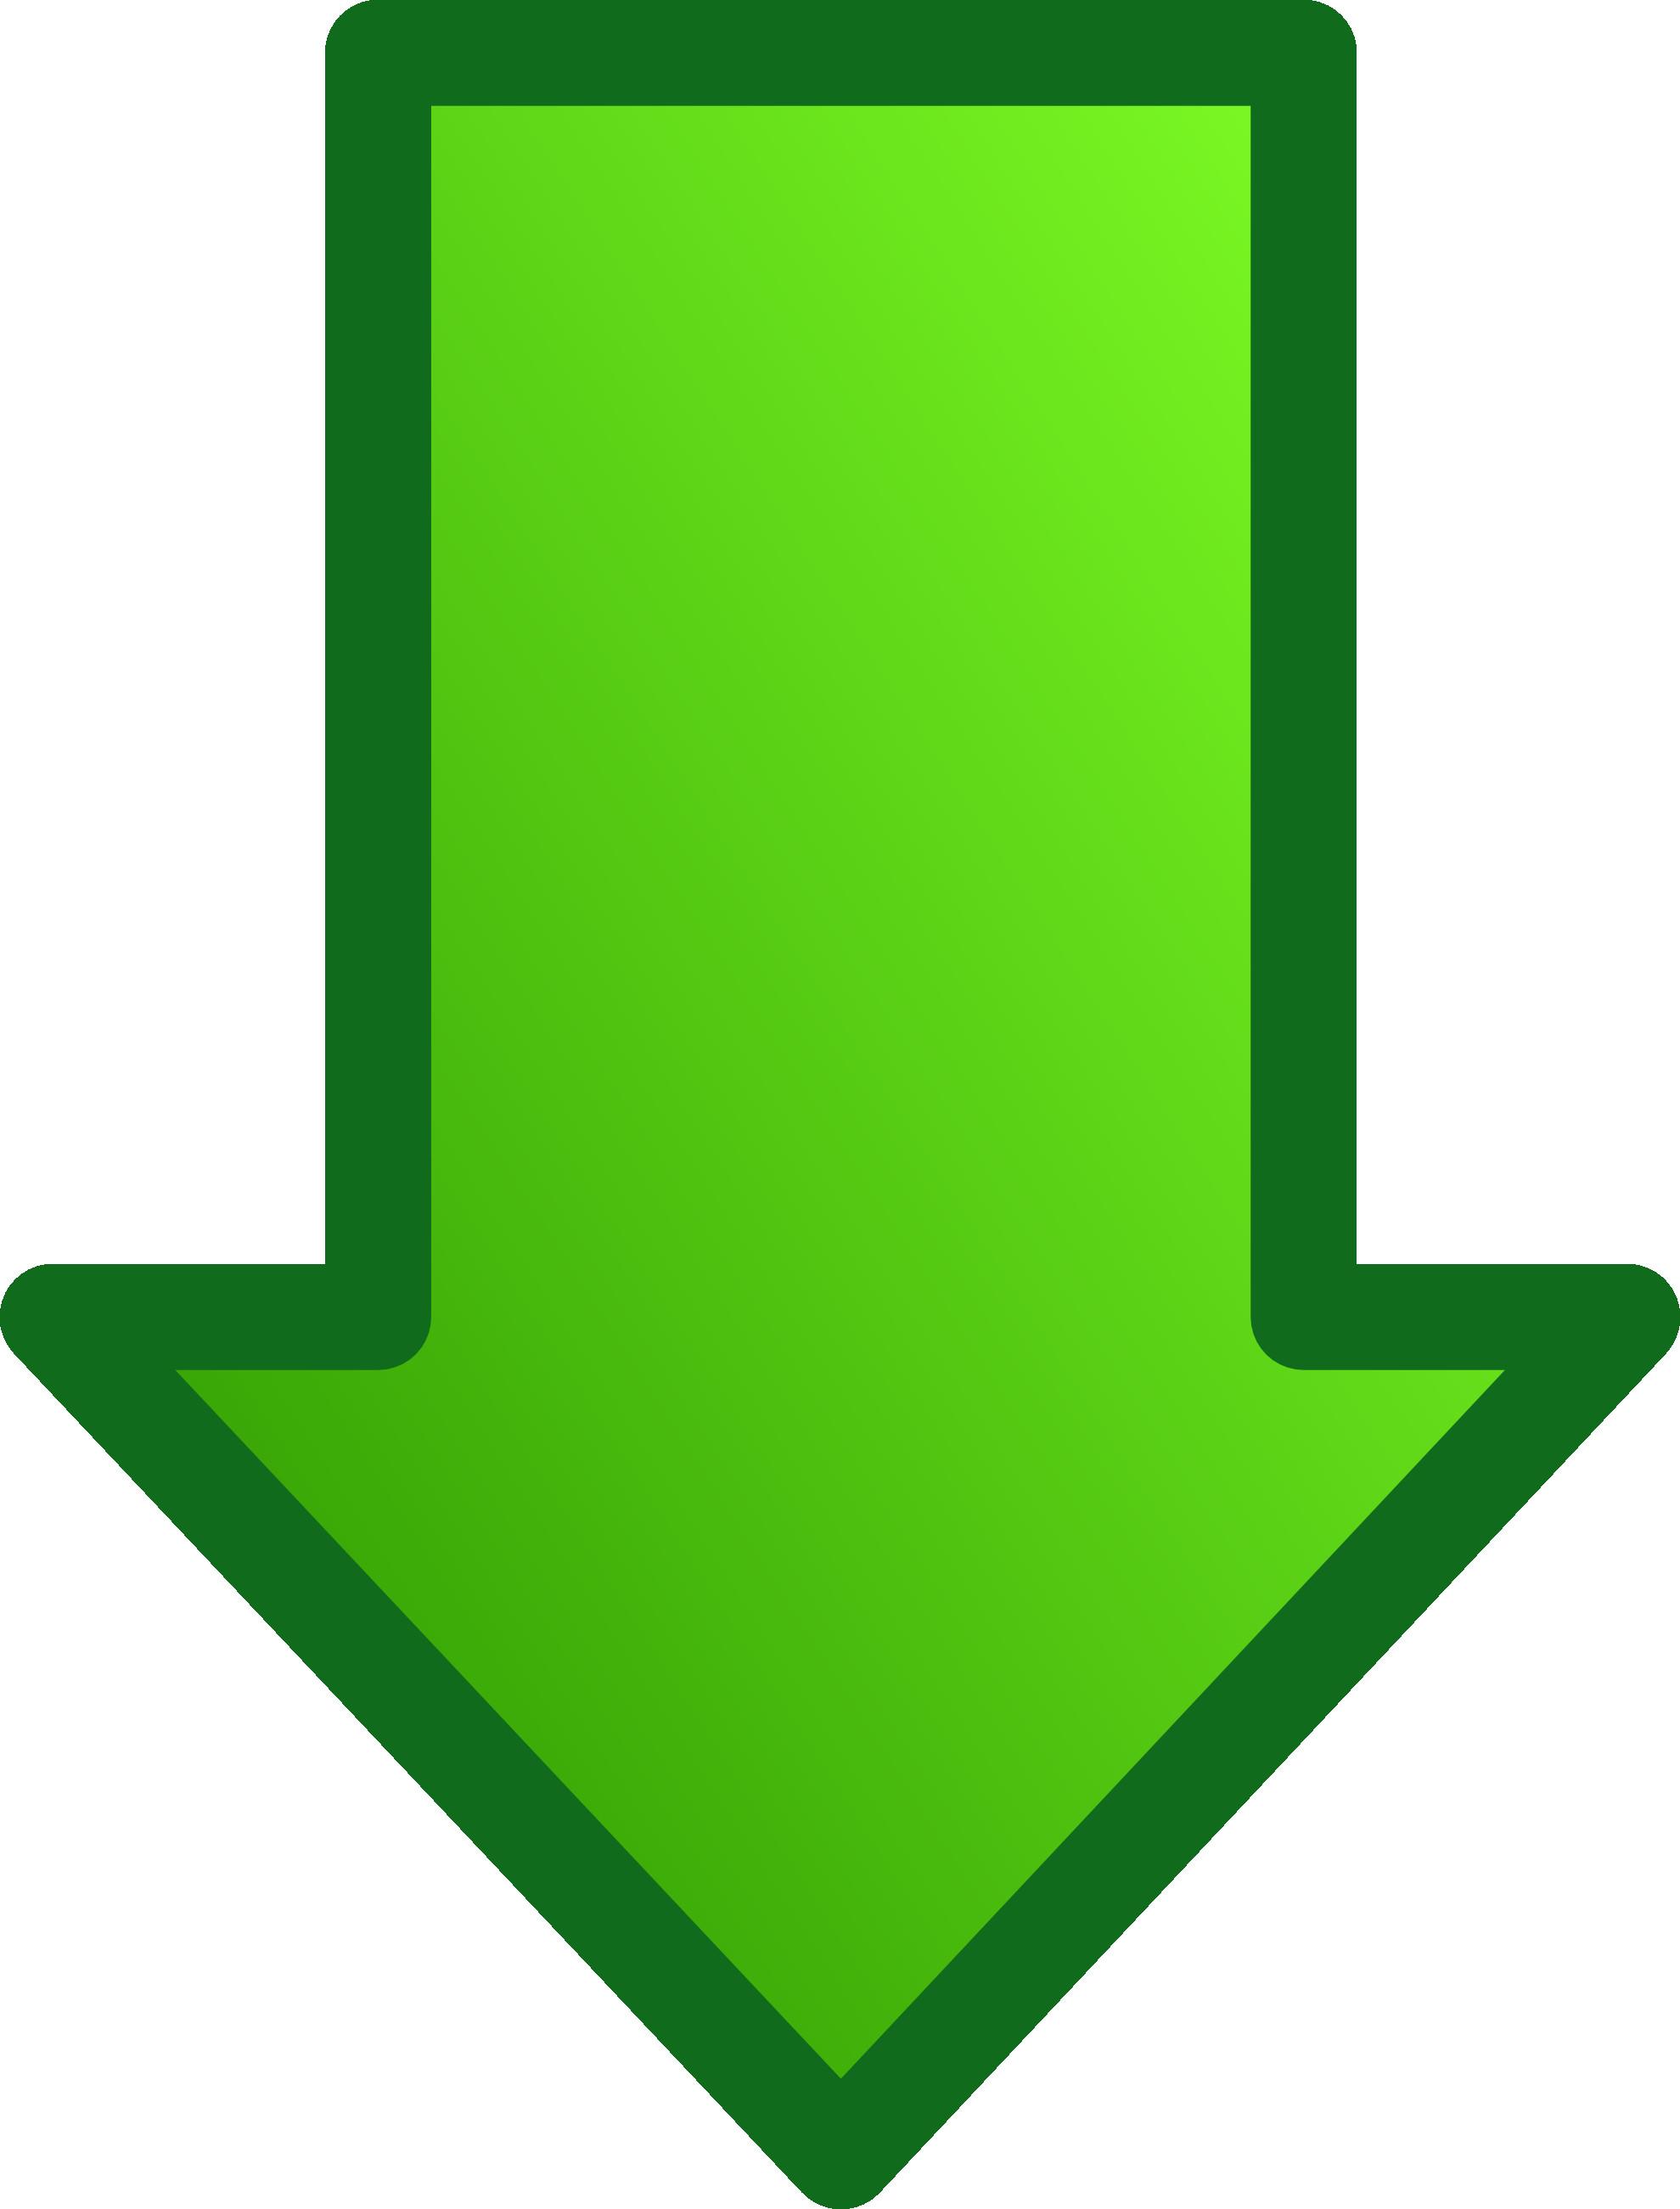 1979x2602 Download Green Arrow Clipart Hq Png Image Freepngimg Fancy Clip